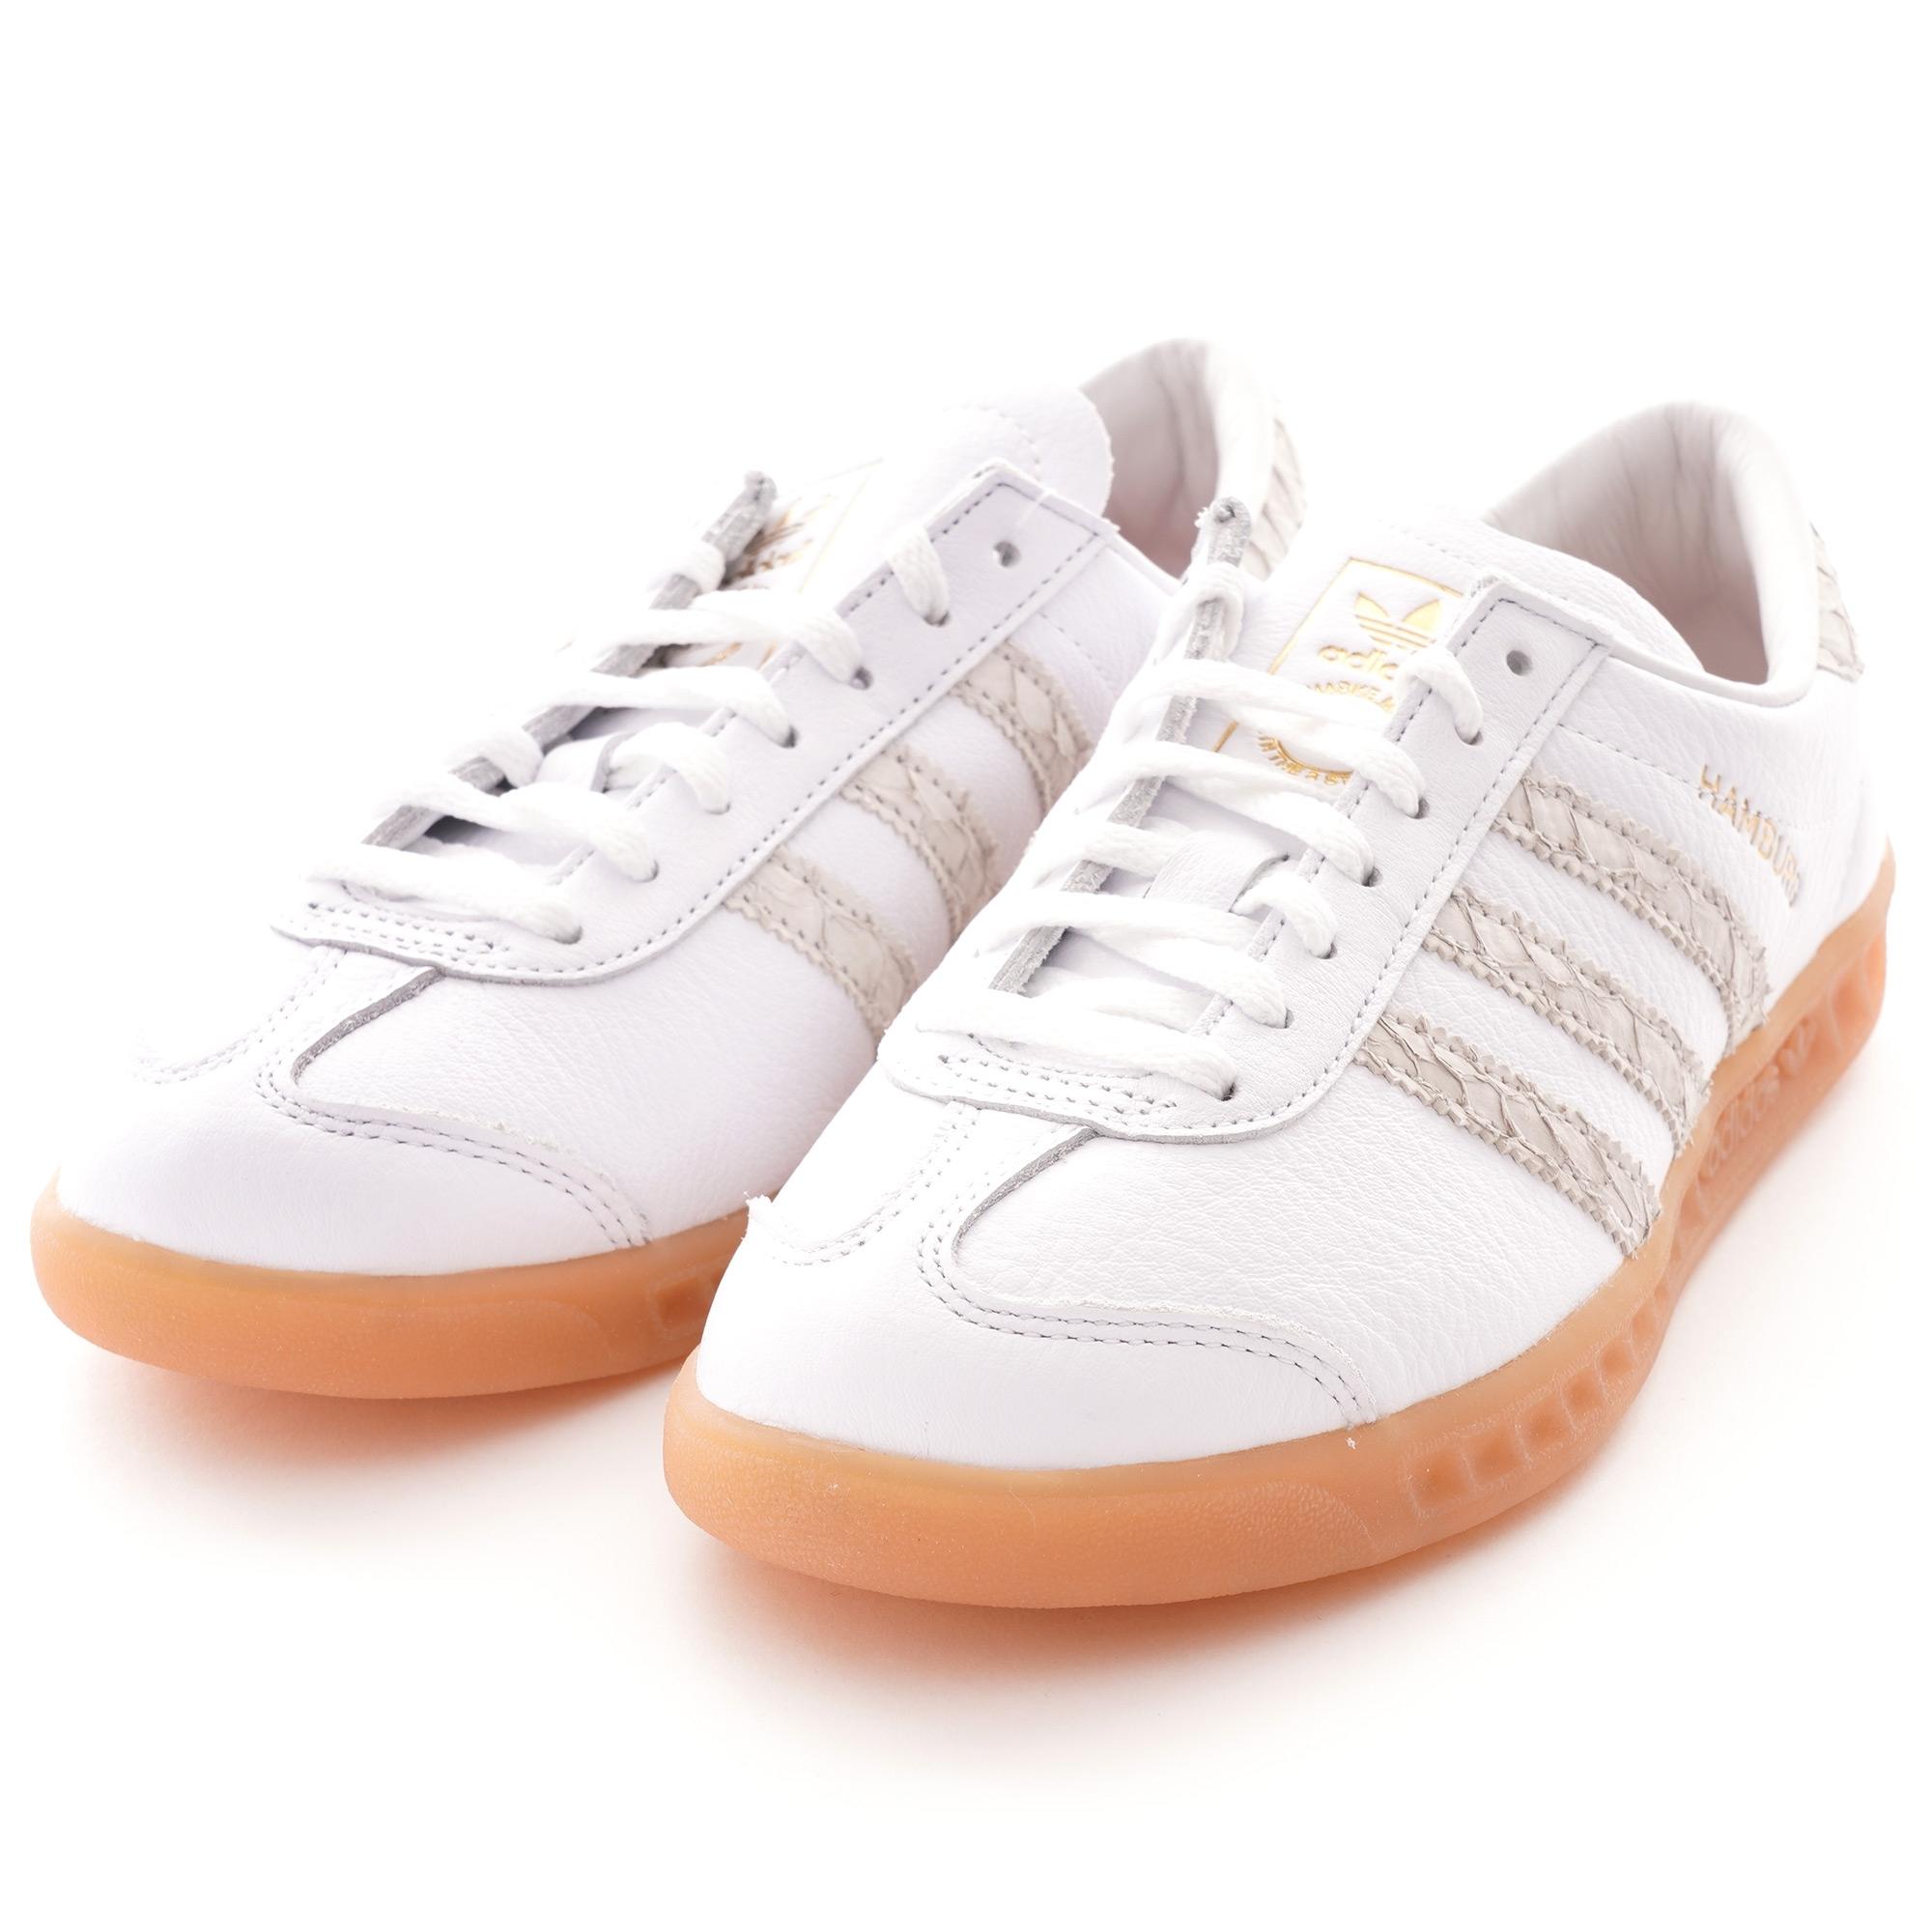 Adidas Originals Hamburg Shoes - White